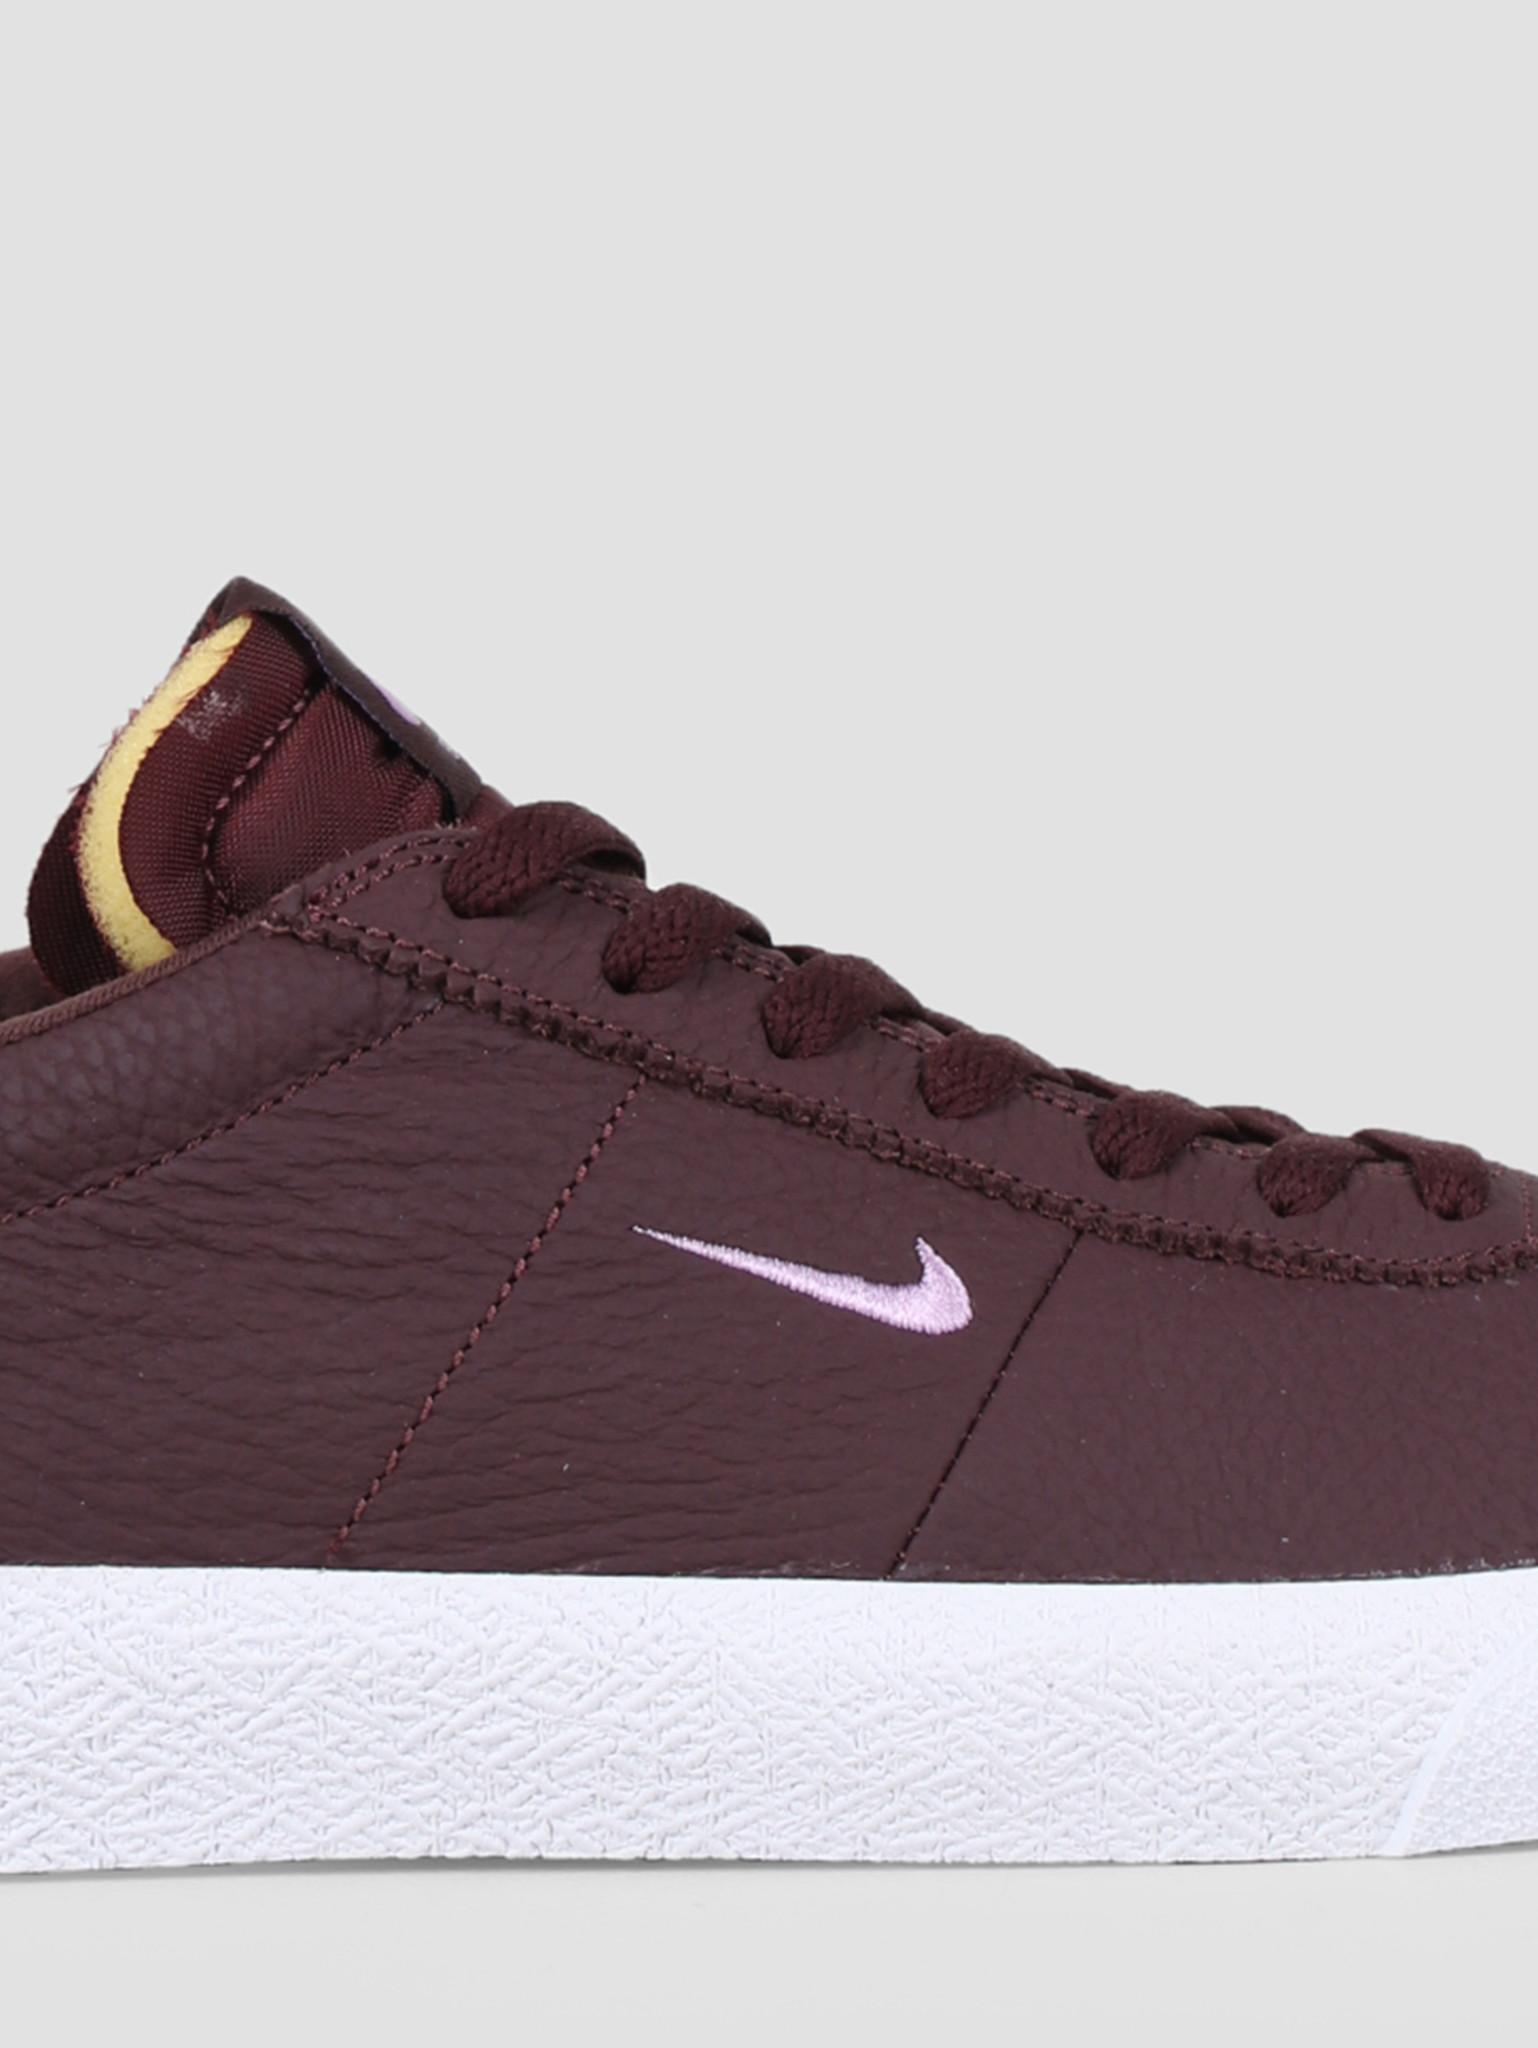 Nike Nike SB Zoom Bruin Mahogany Violet Star AQ7941-202